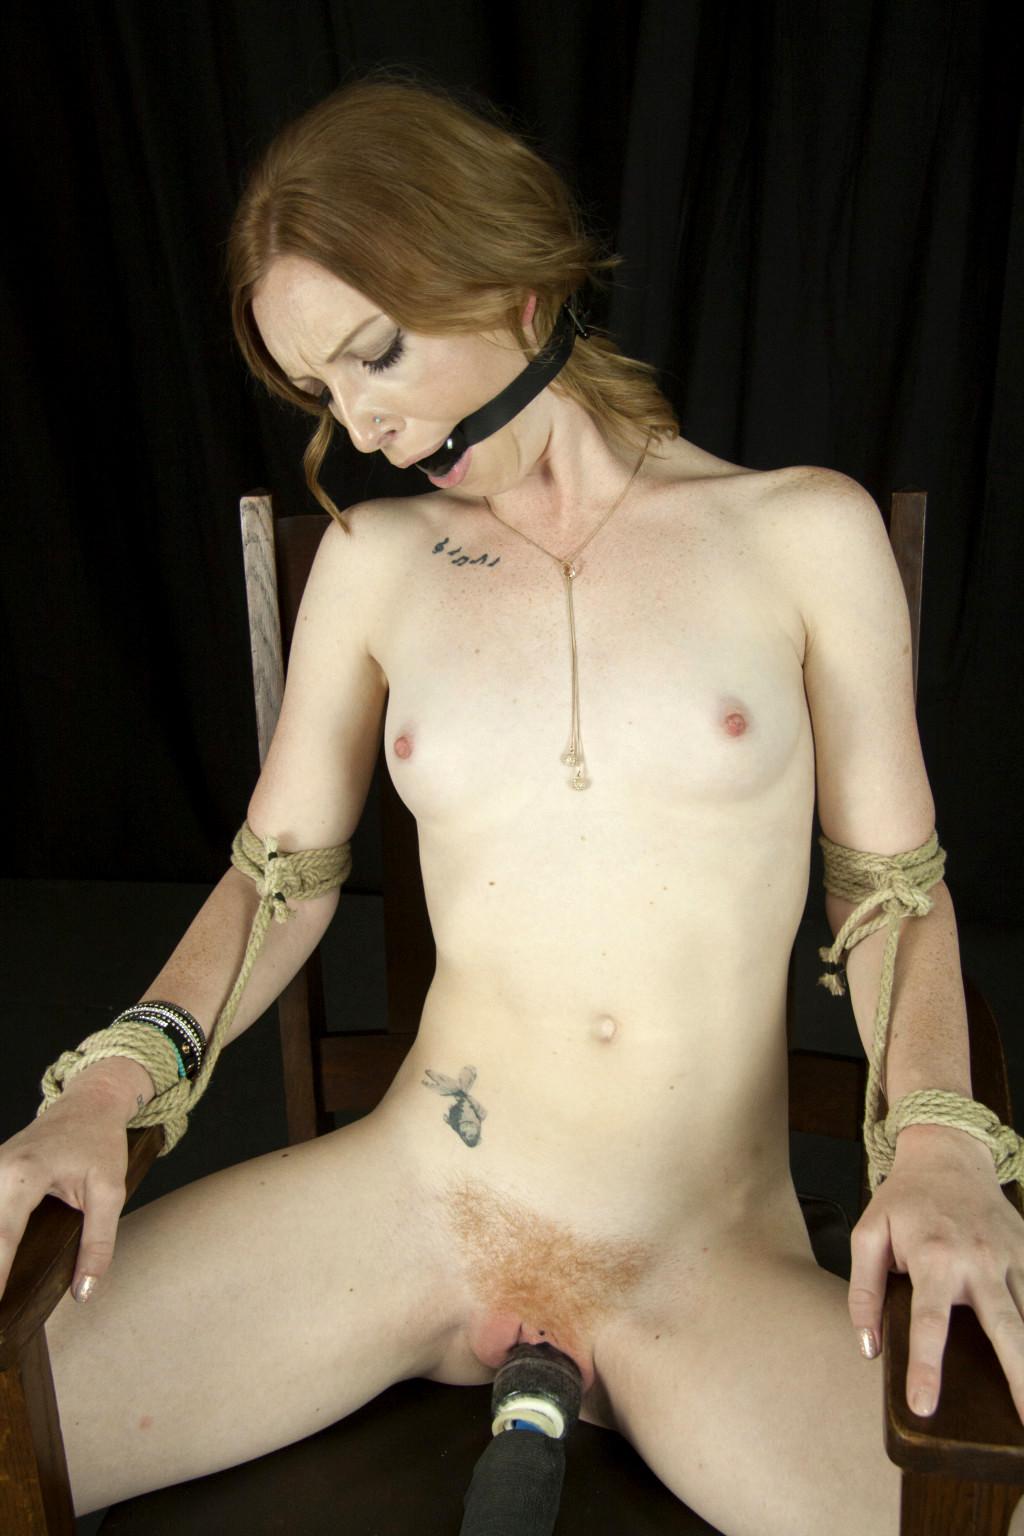 Slave girl training bondage forced orgasm